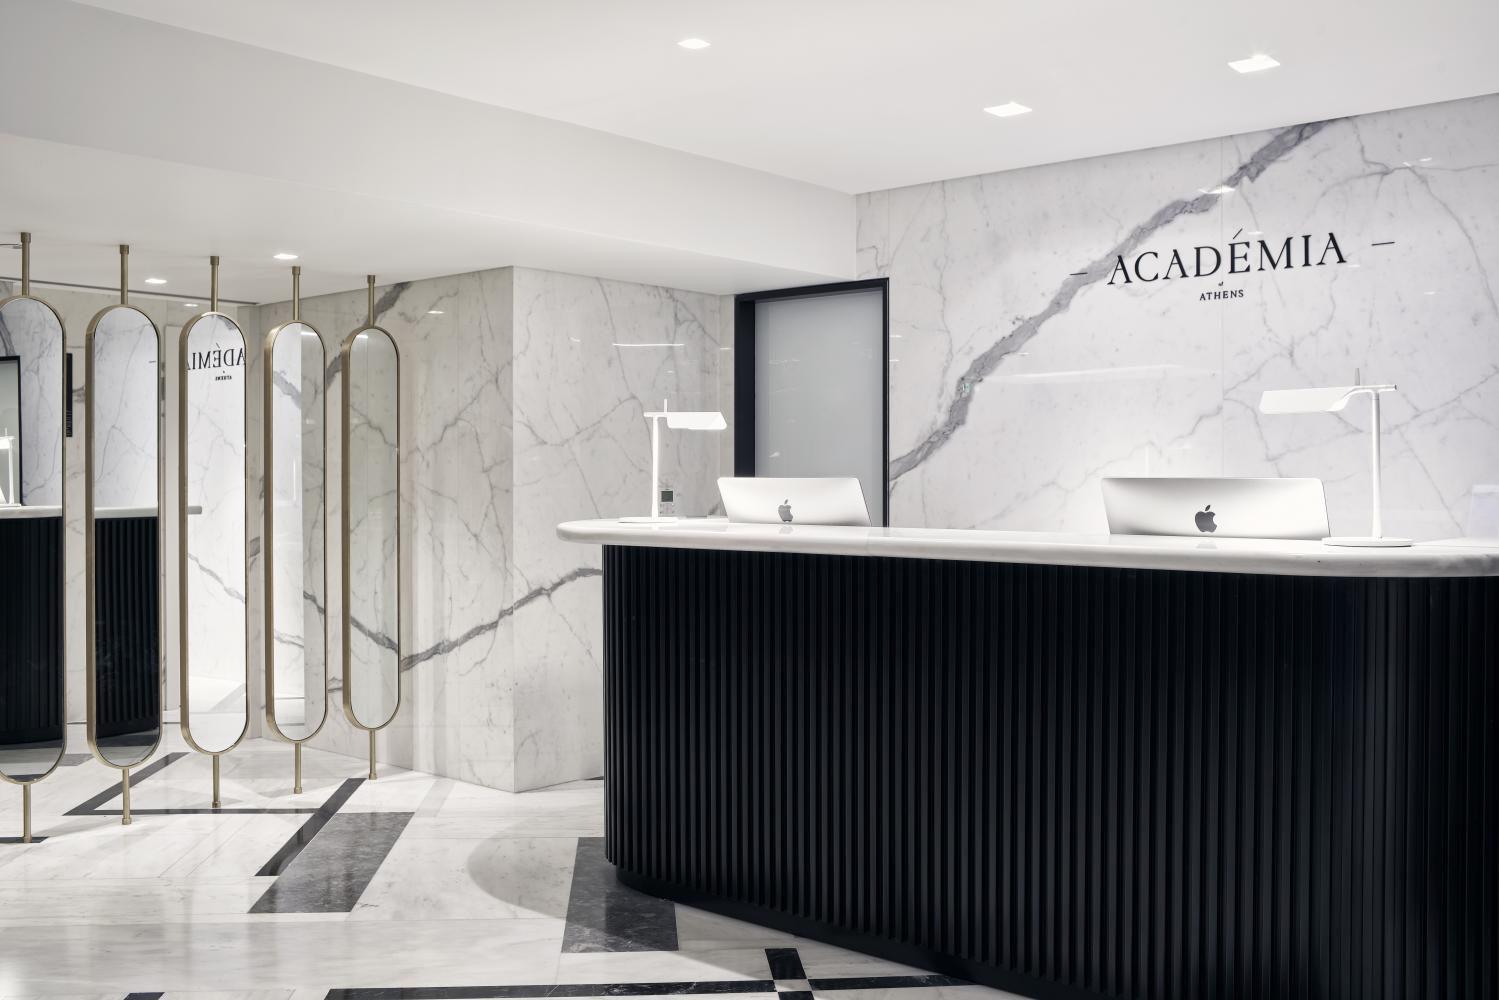 Academia Hotel of Athens - Image 1